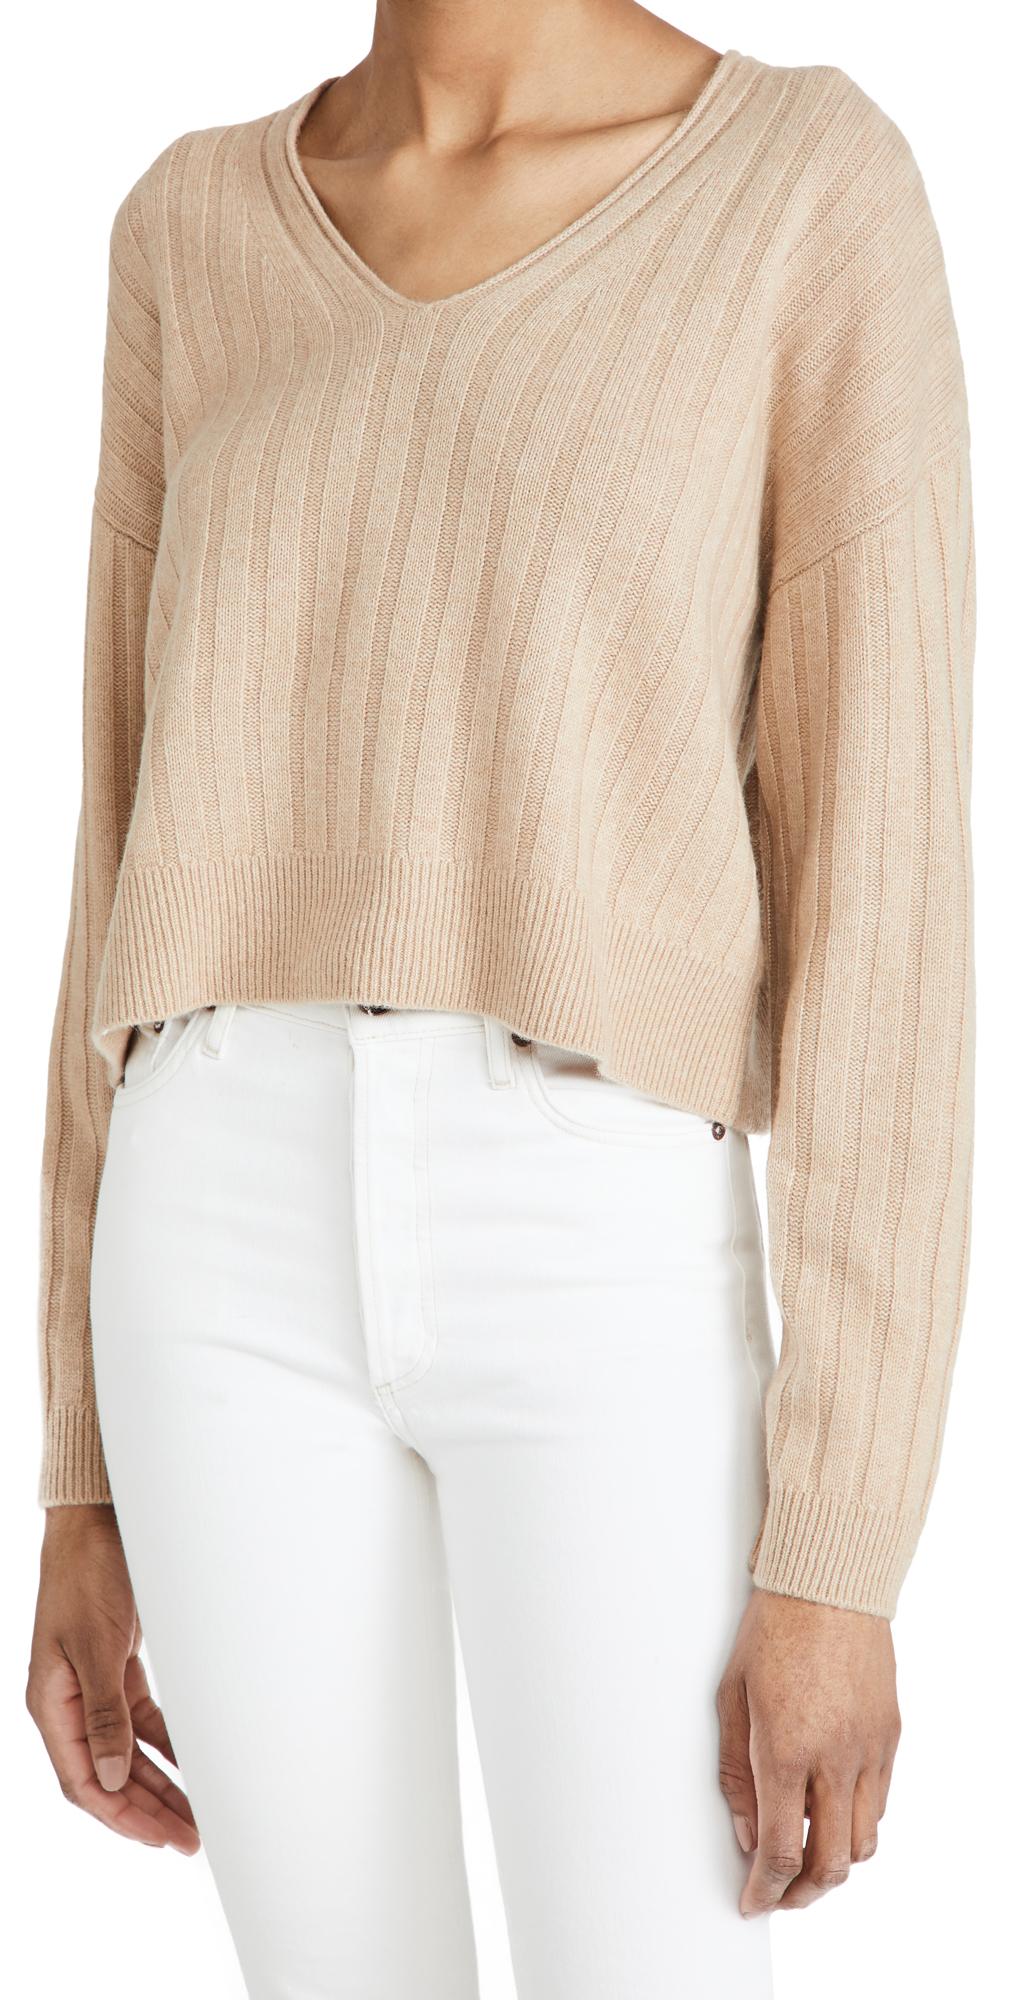 Sablyn Maia Cashmere Sweater